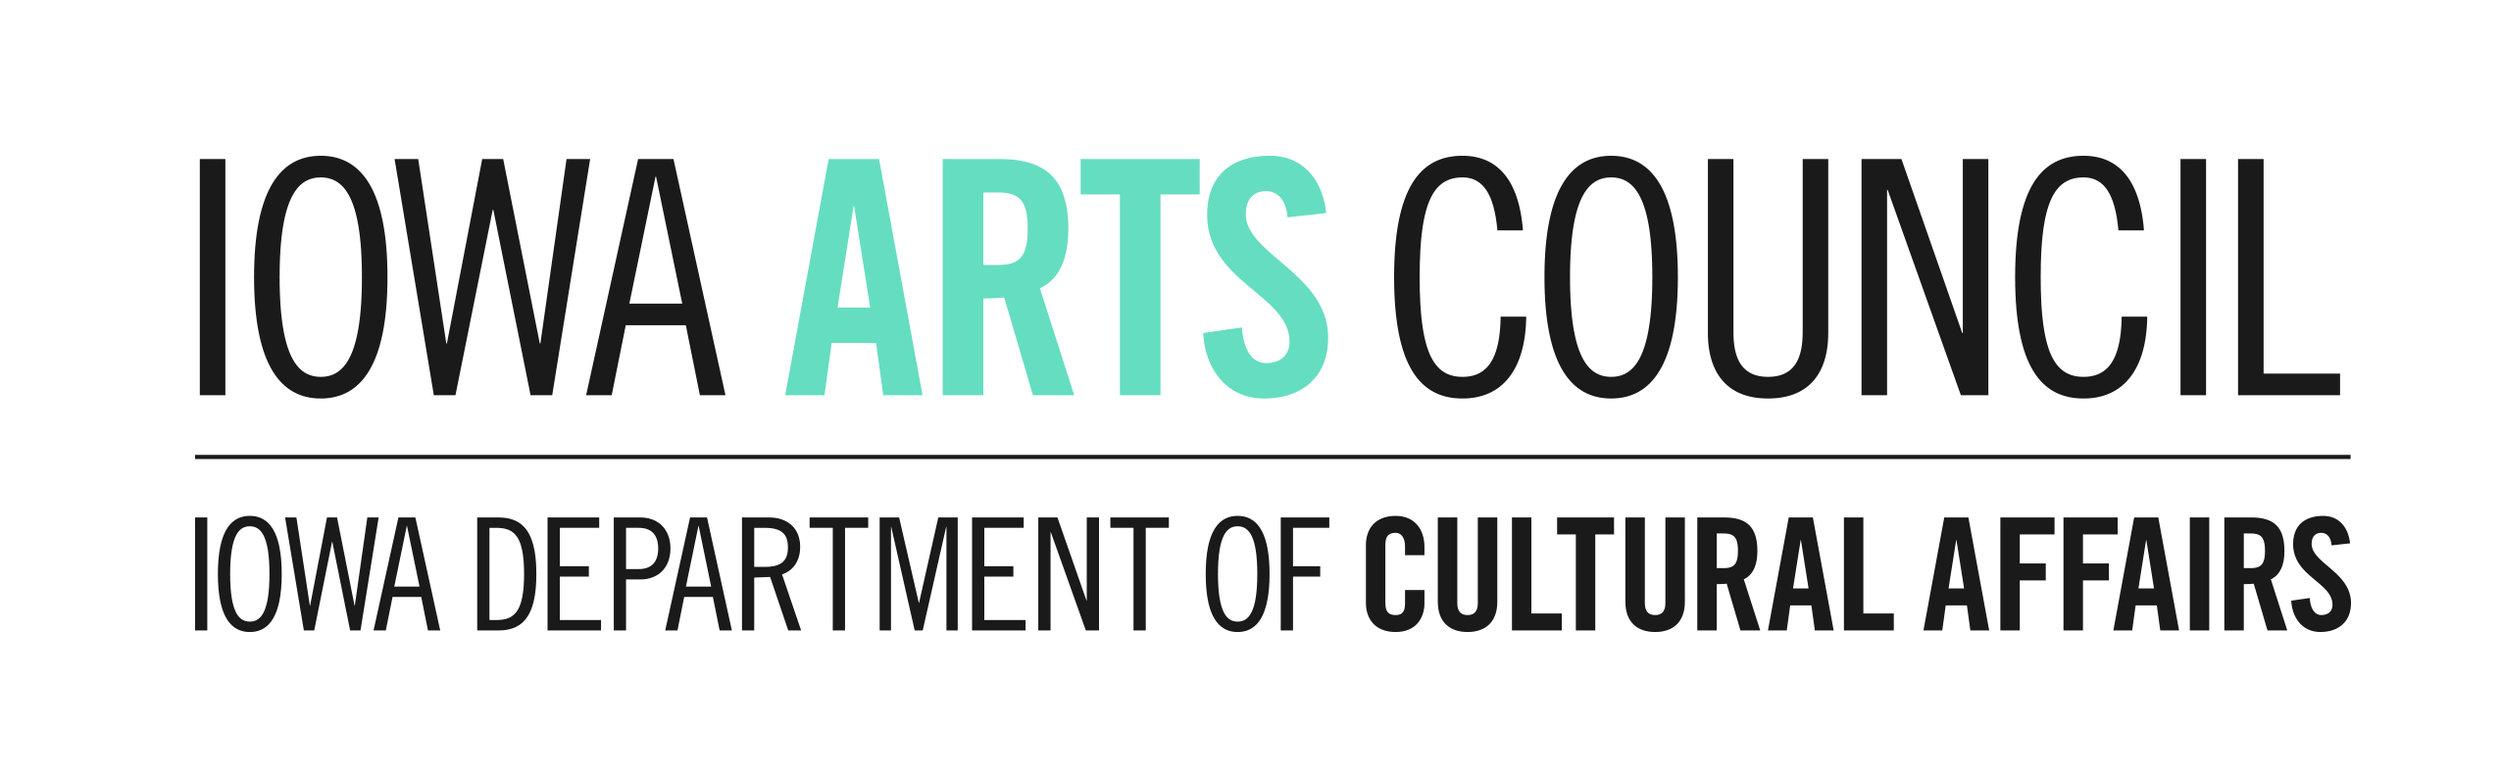 IDCA Iowa Arts Council (COLOR CMYK).jpg